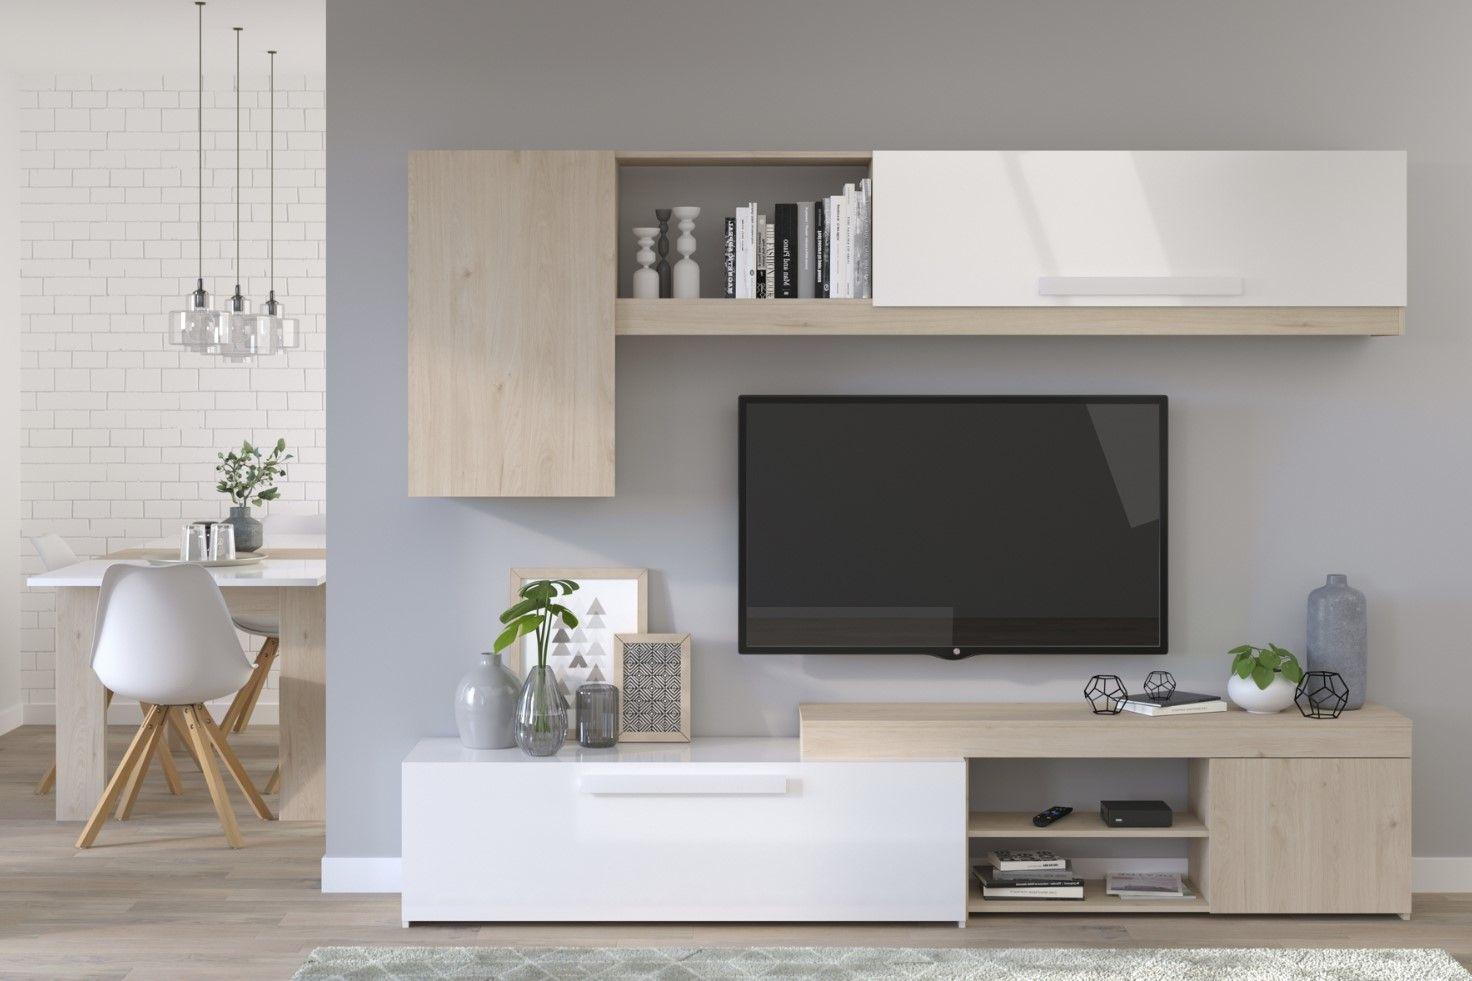 Mur Tv Gioia Imitation Chene Et Blanc Pas Cher Meuble Tv But En 2020 Idee Deco Meuble Tv Meuble Tv Et Table Basse Ensemble Meuble Tv Et Table Basse